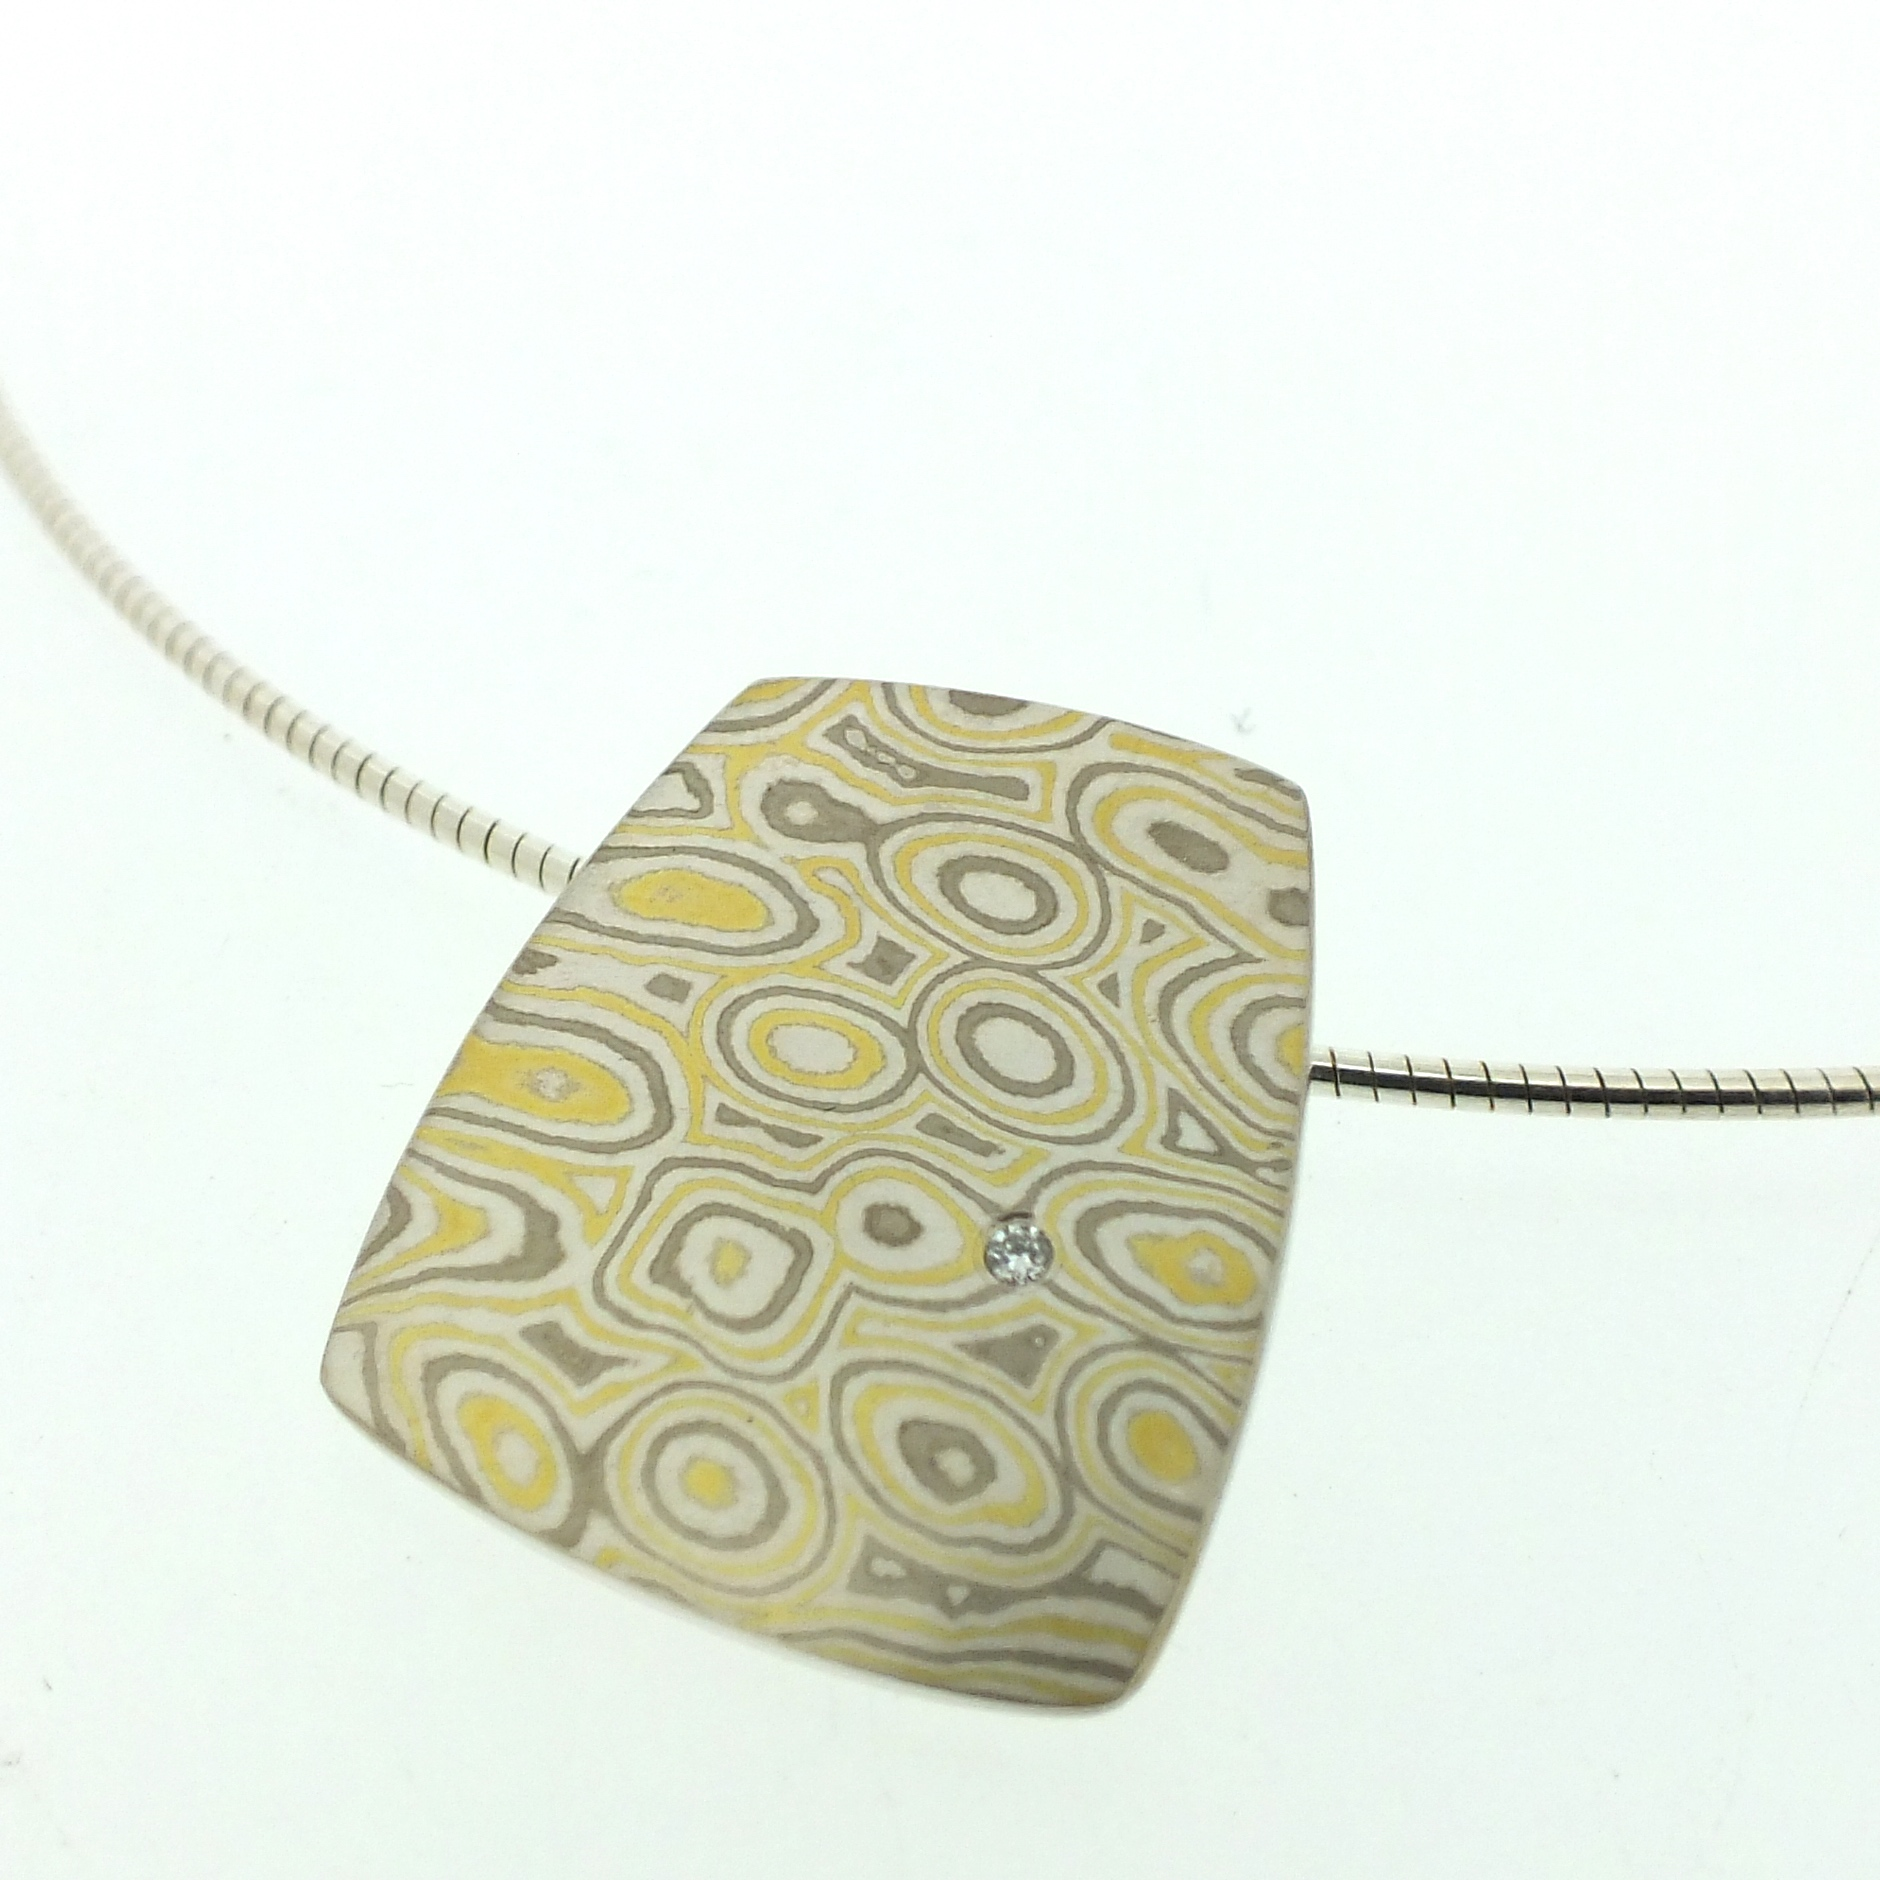 22k gold, 18k white gold and silver mokume gane large Fower Neukit pendant with diamond detail